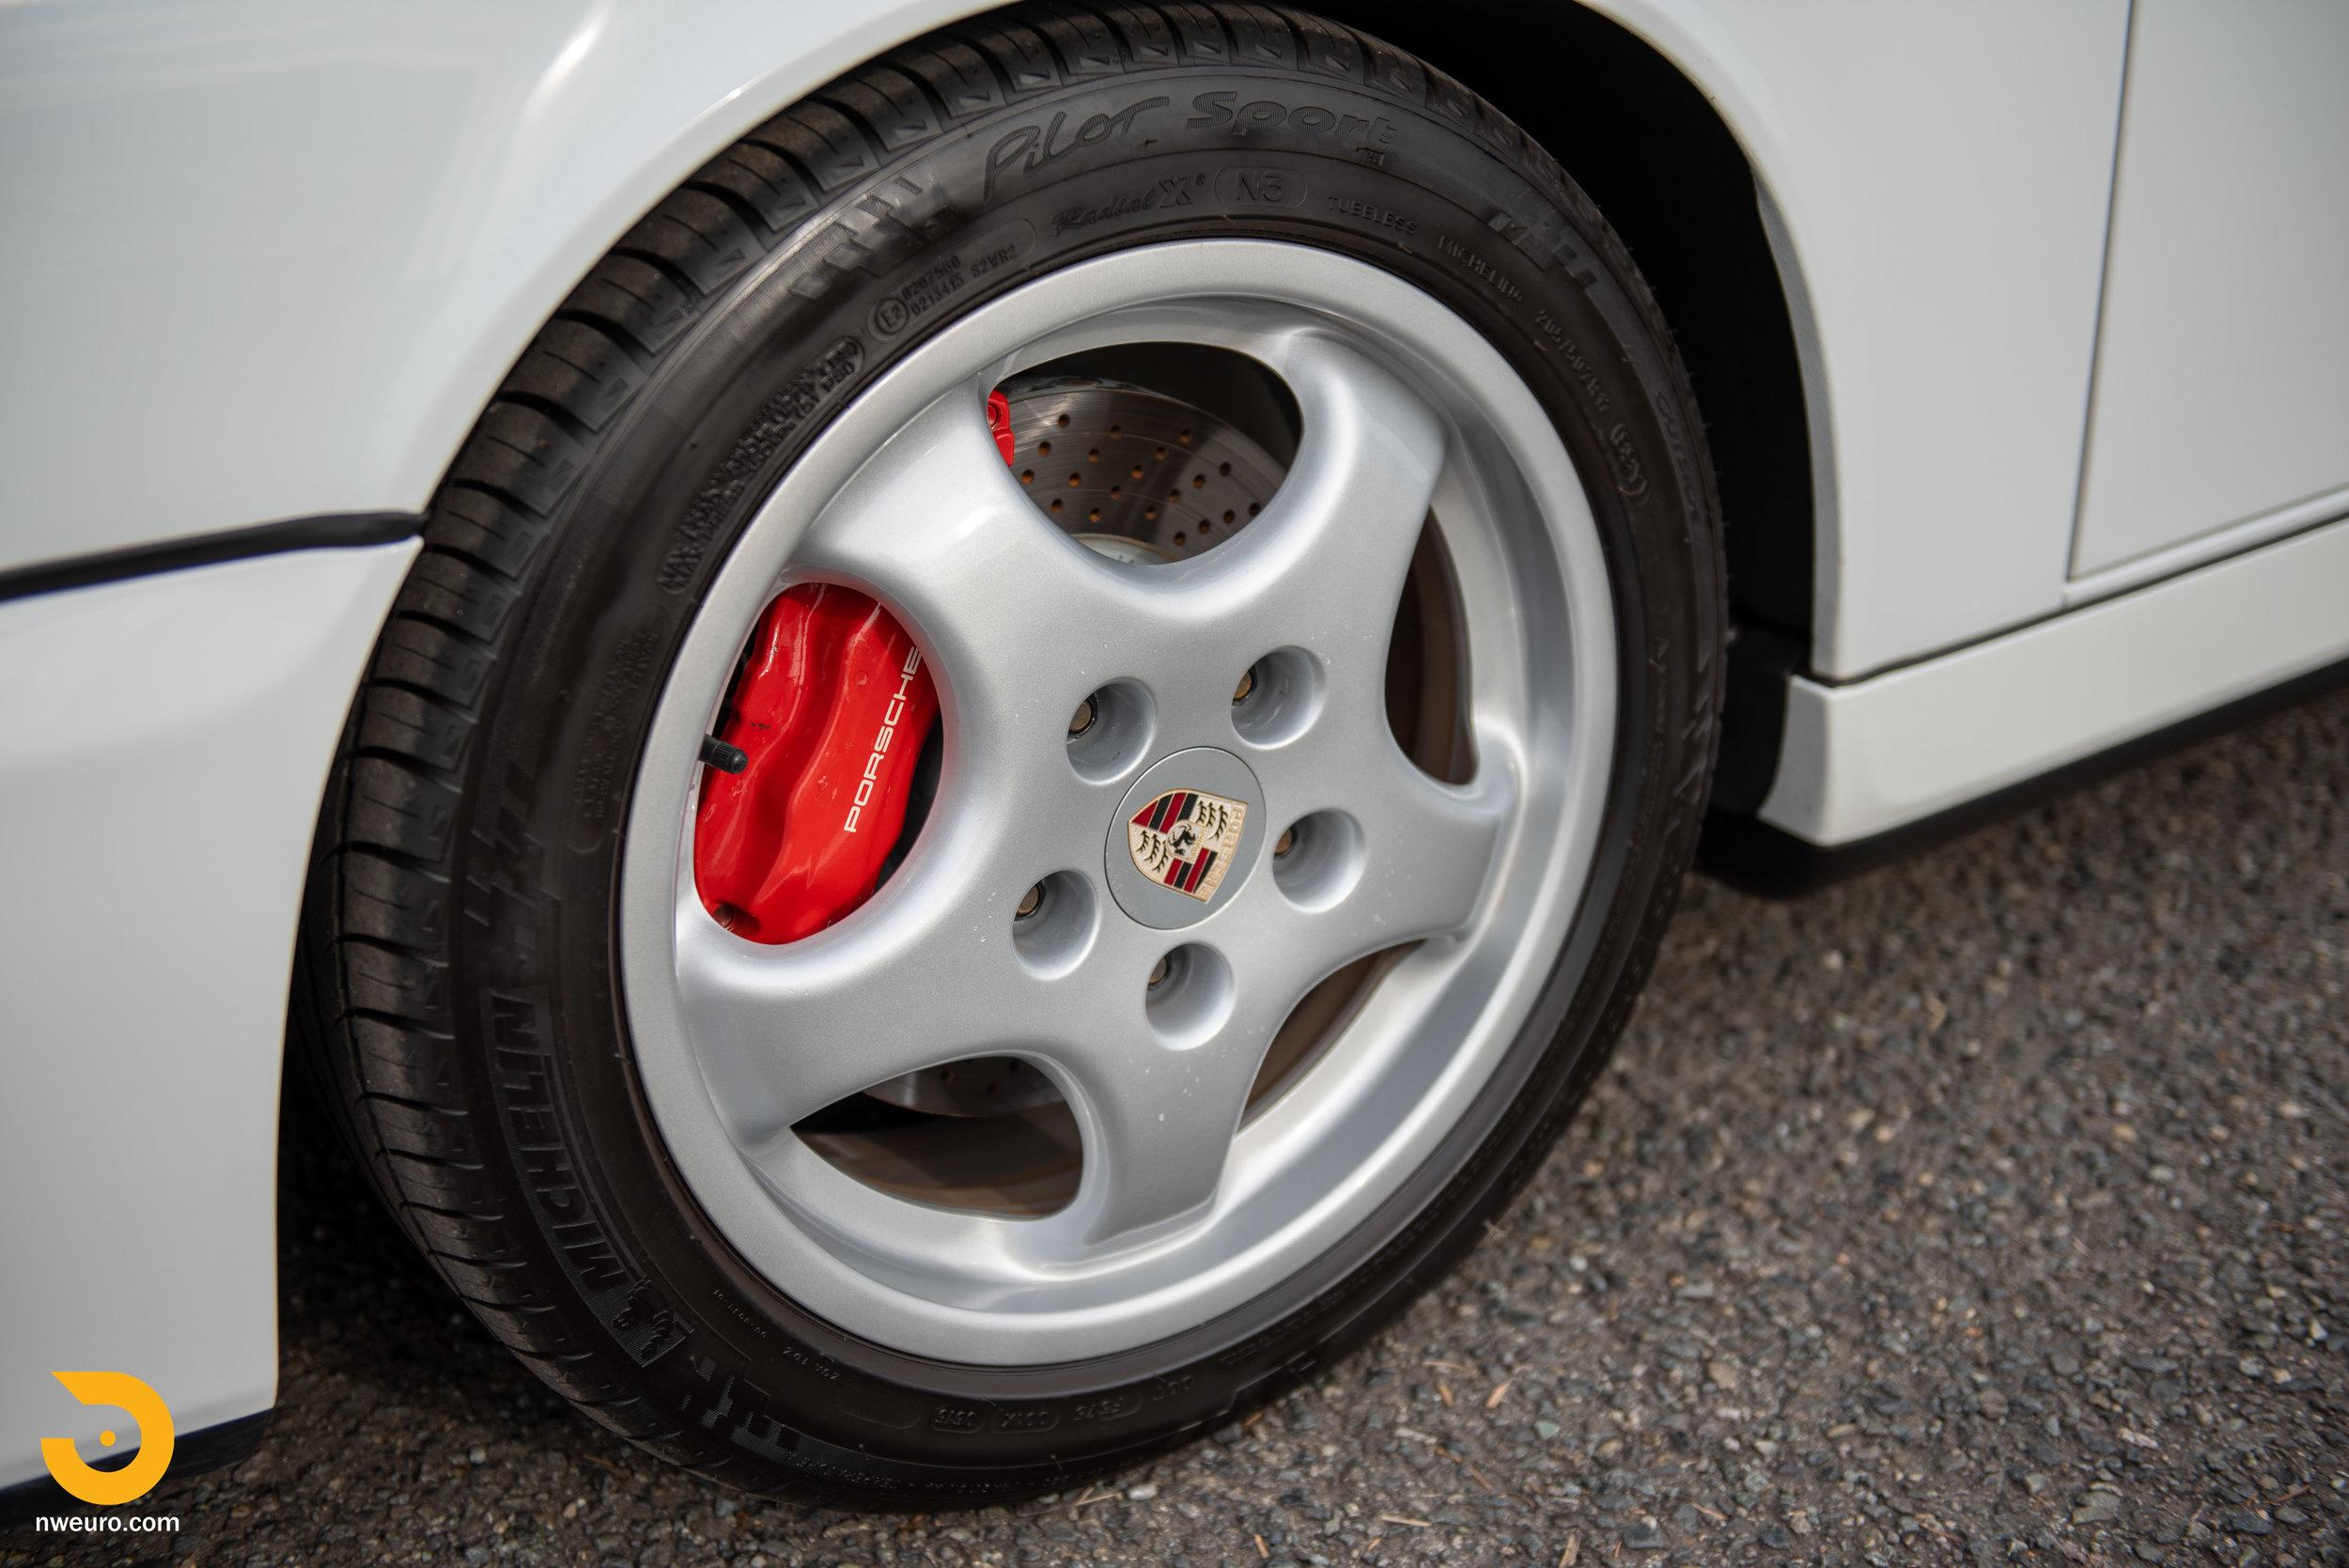 1993 Porsche RS America White-22.jpg